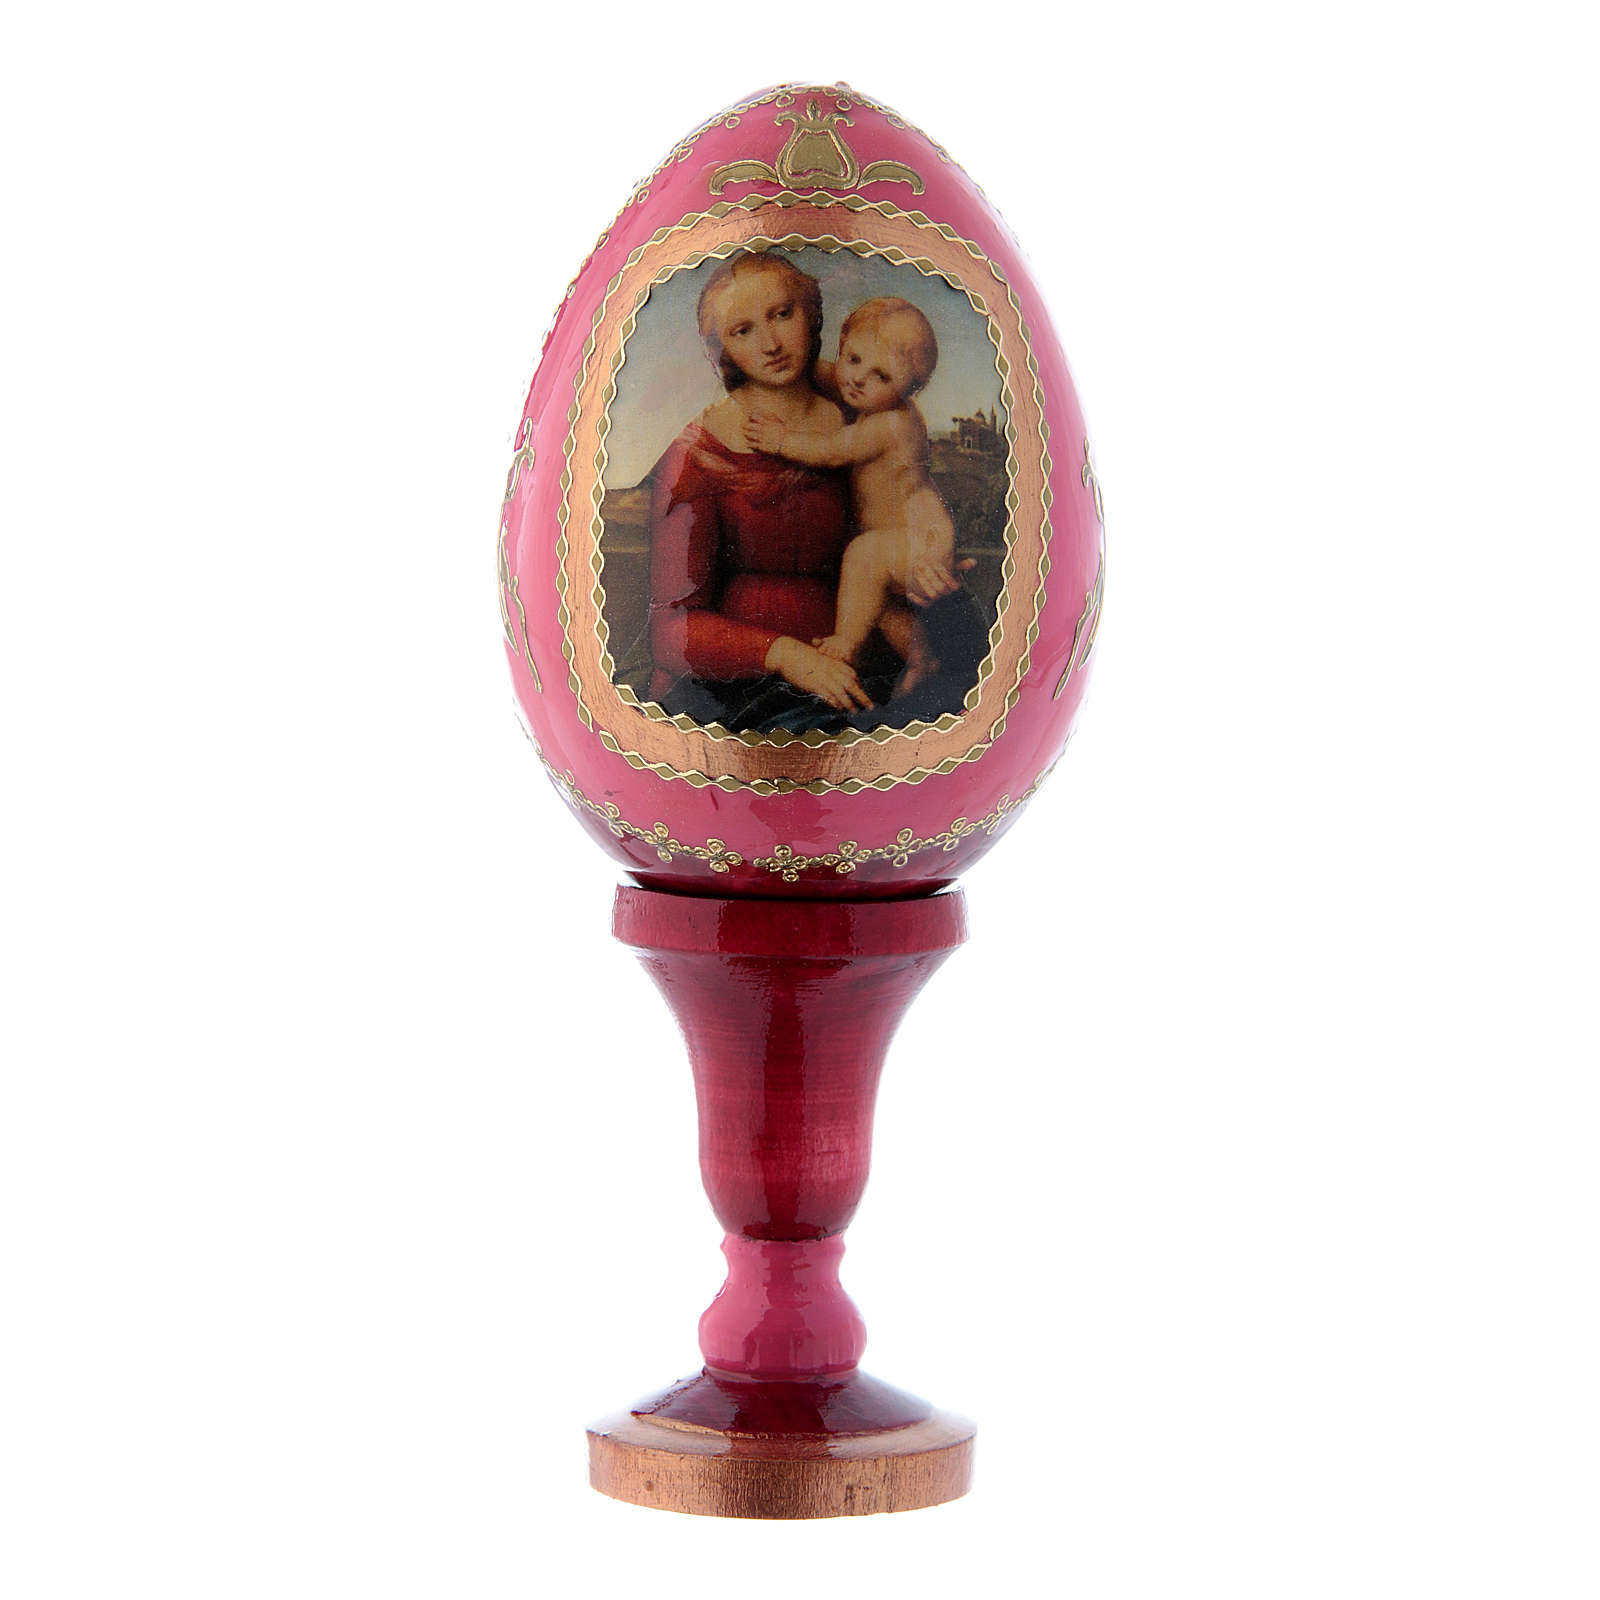 Oeuf rouge icône russe La Petite Madone Cowper h tot 13 cm 4